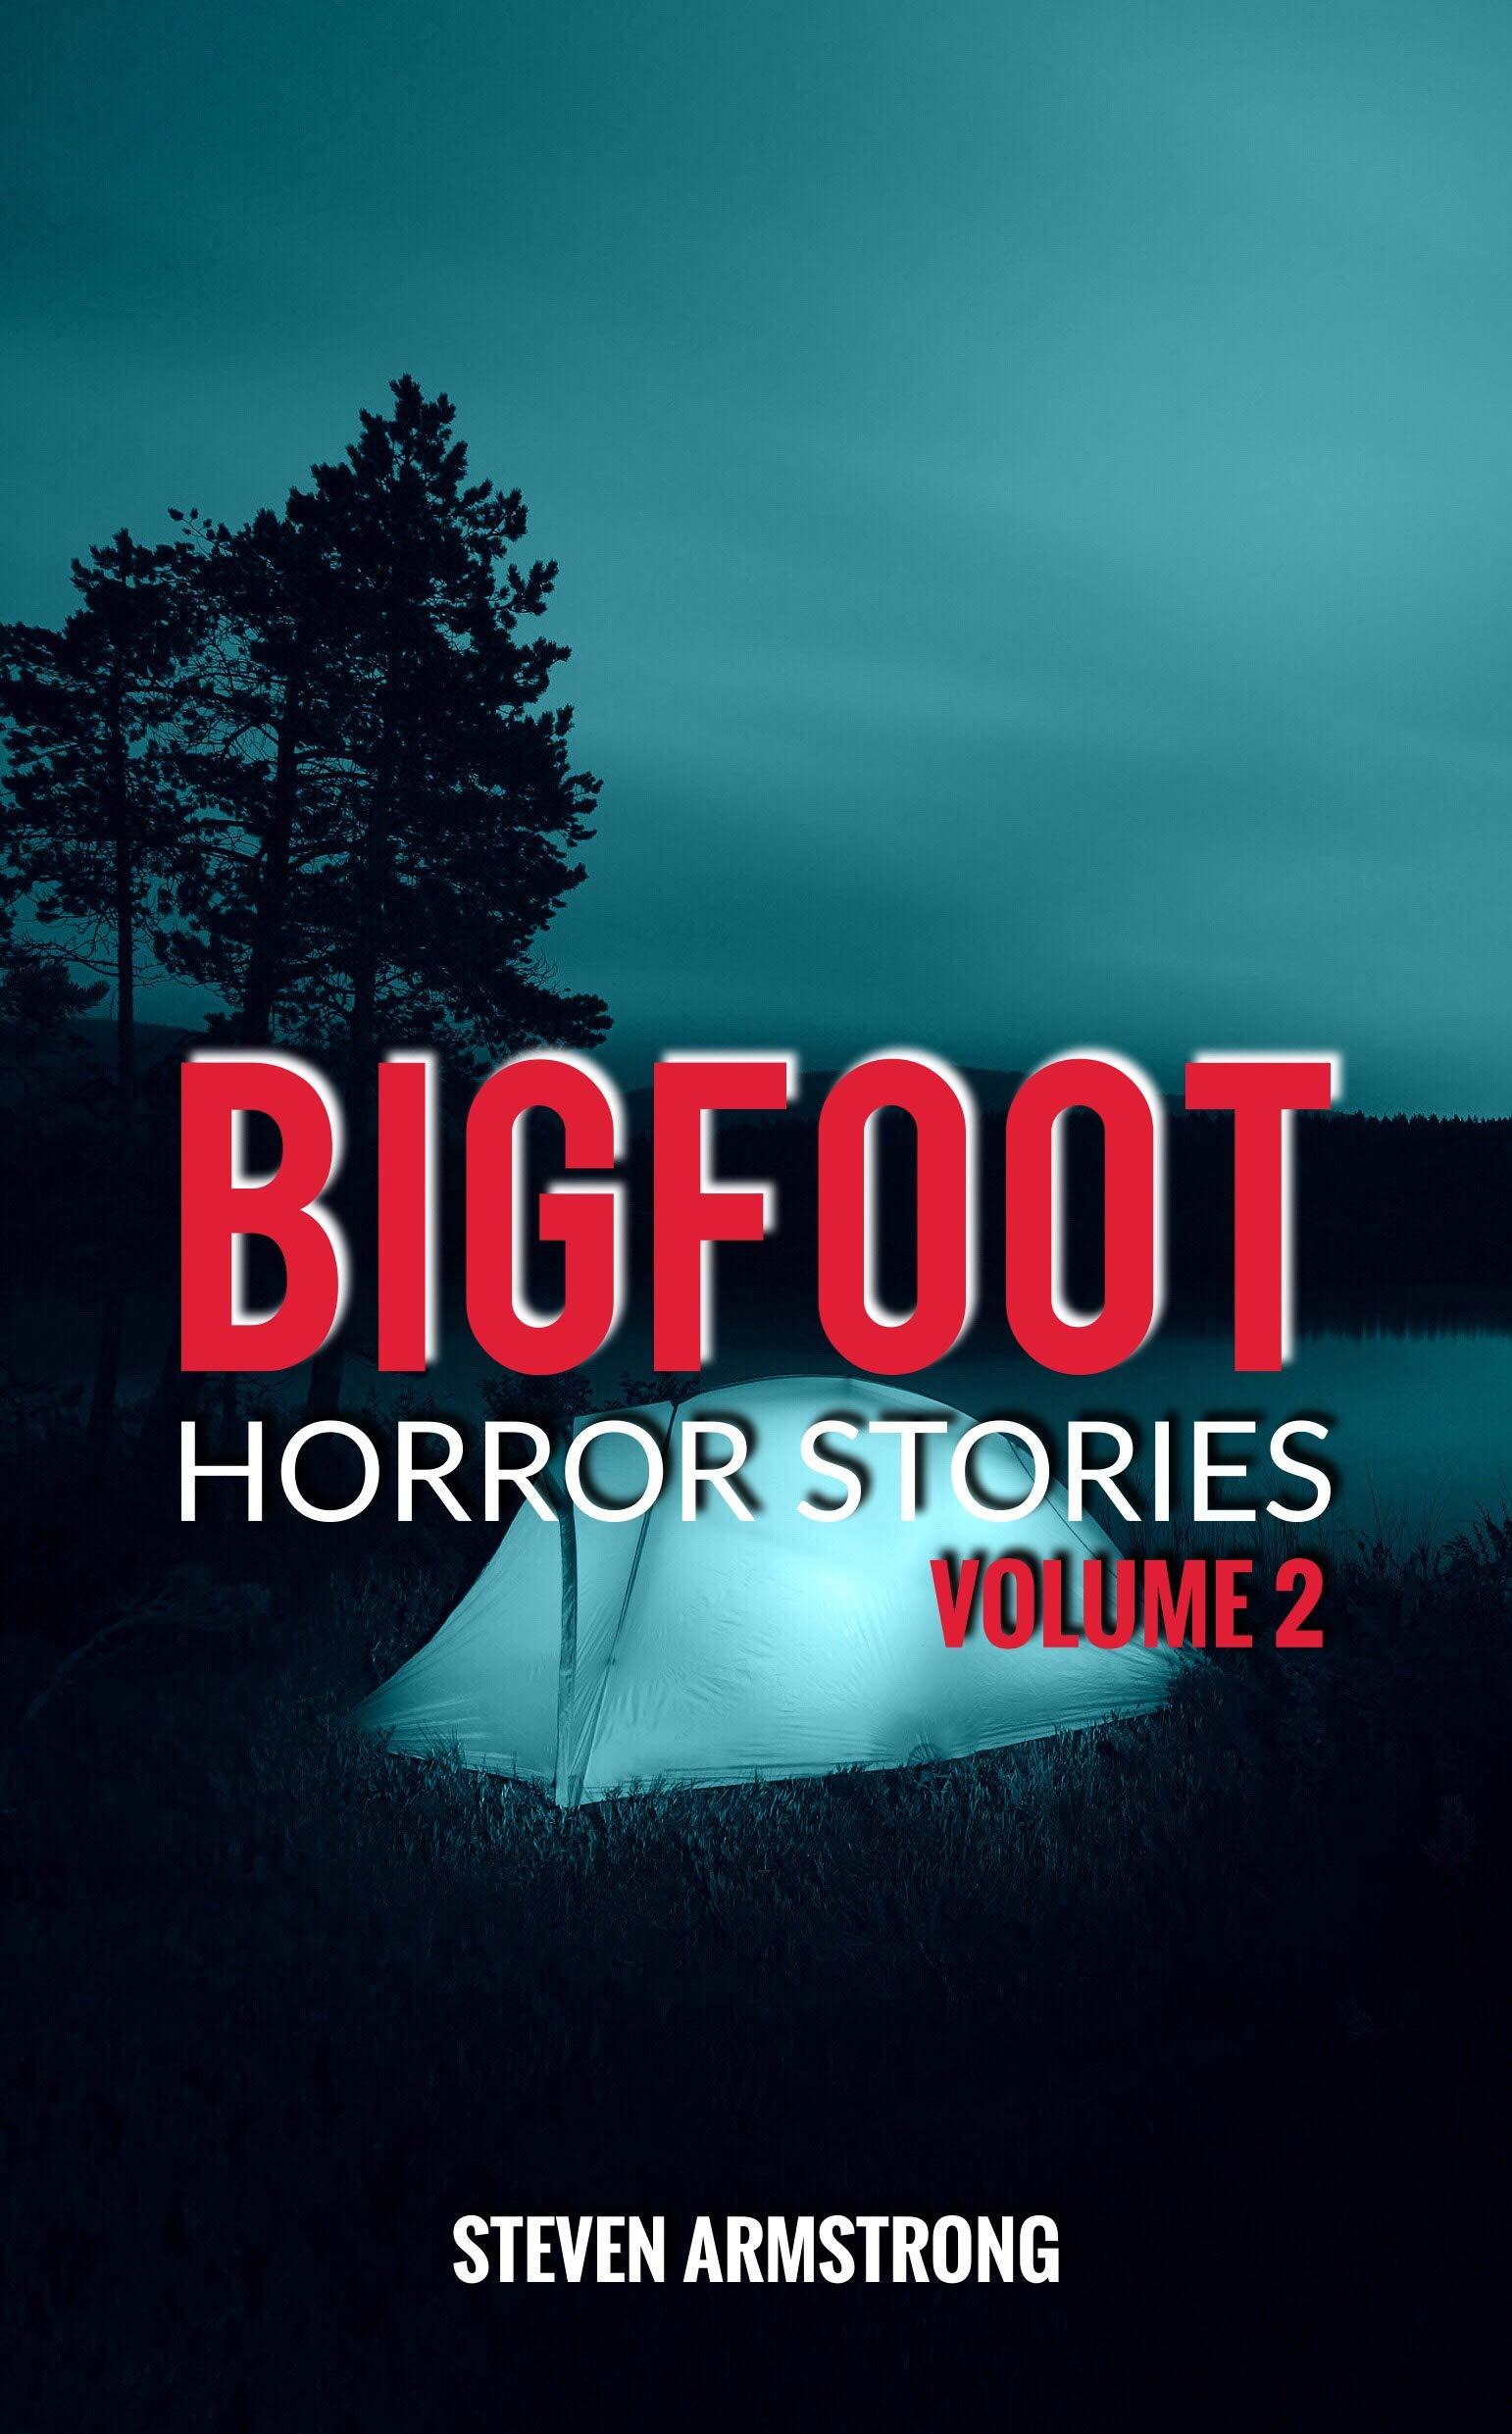 Bigfoot Horror Stories: Volume 2